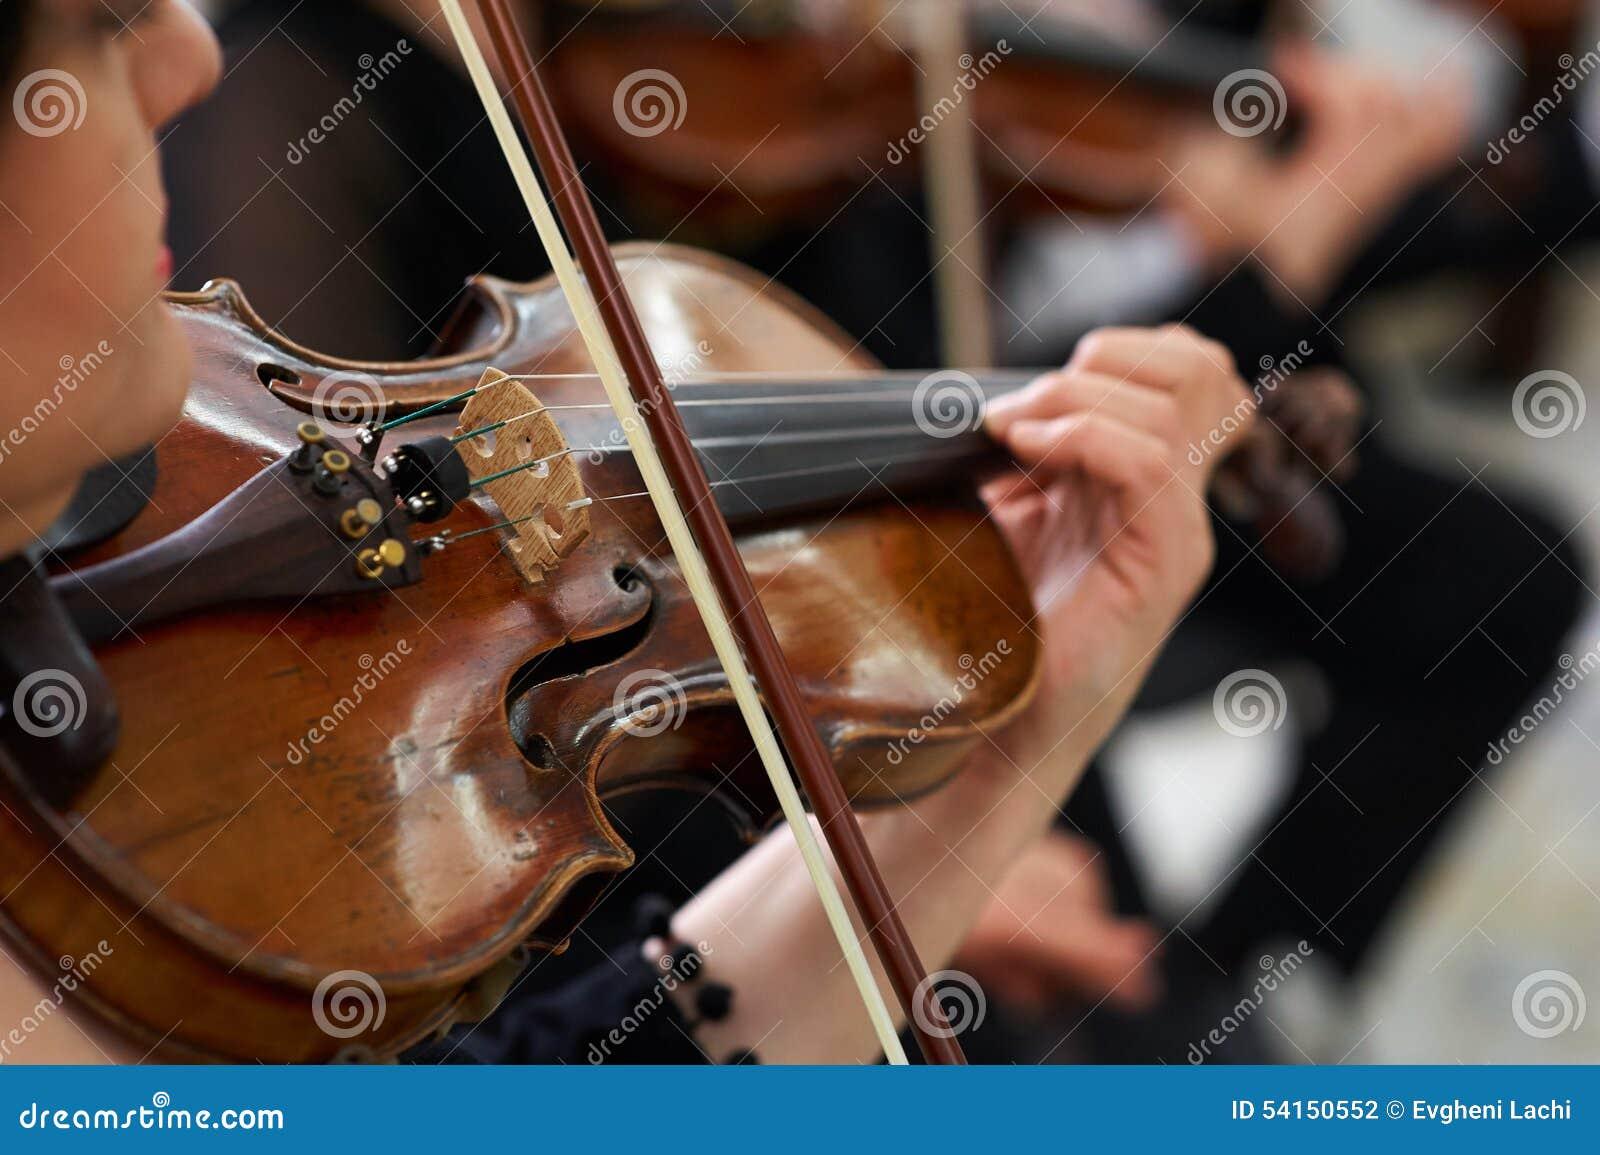 Violinista Playing Classical Violin das mulheres